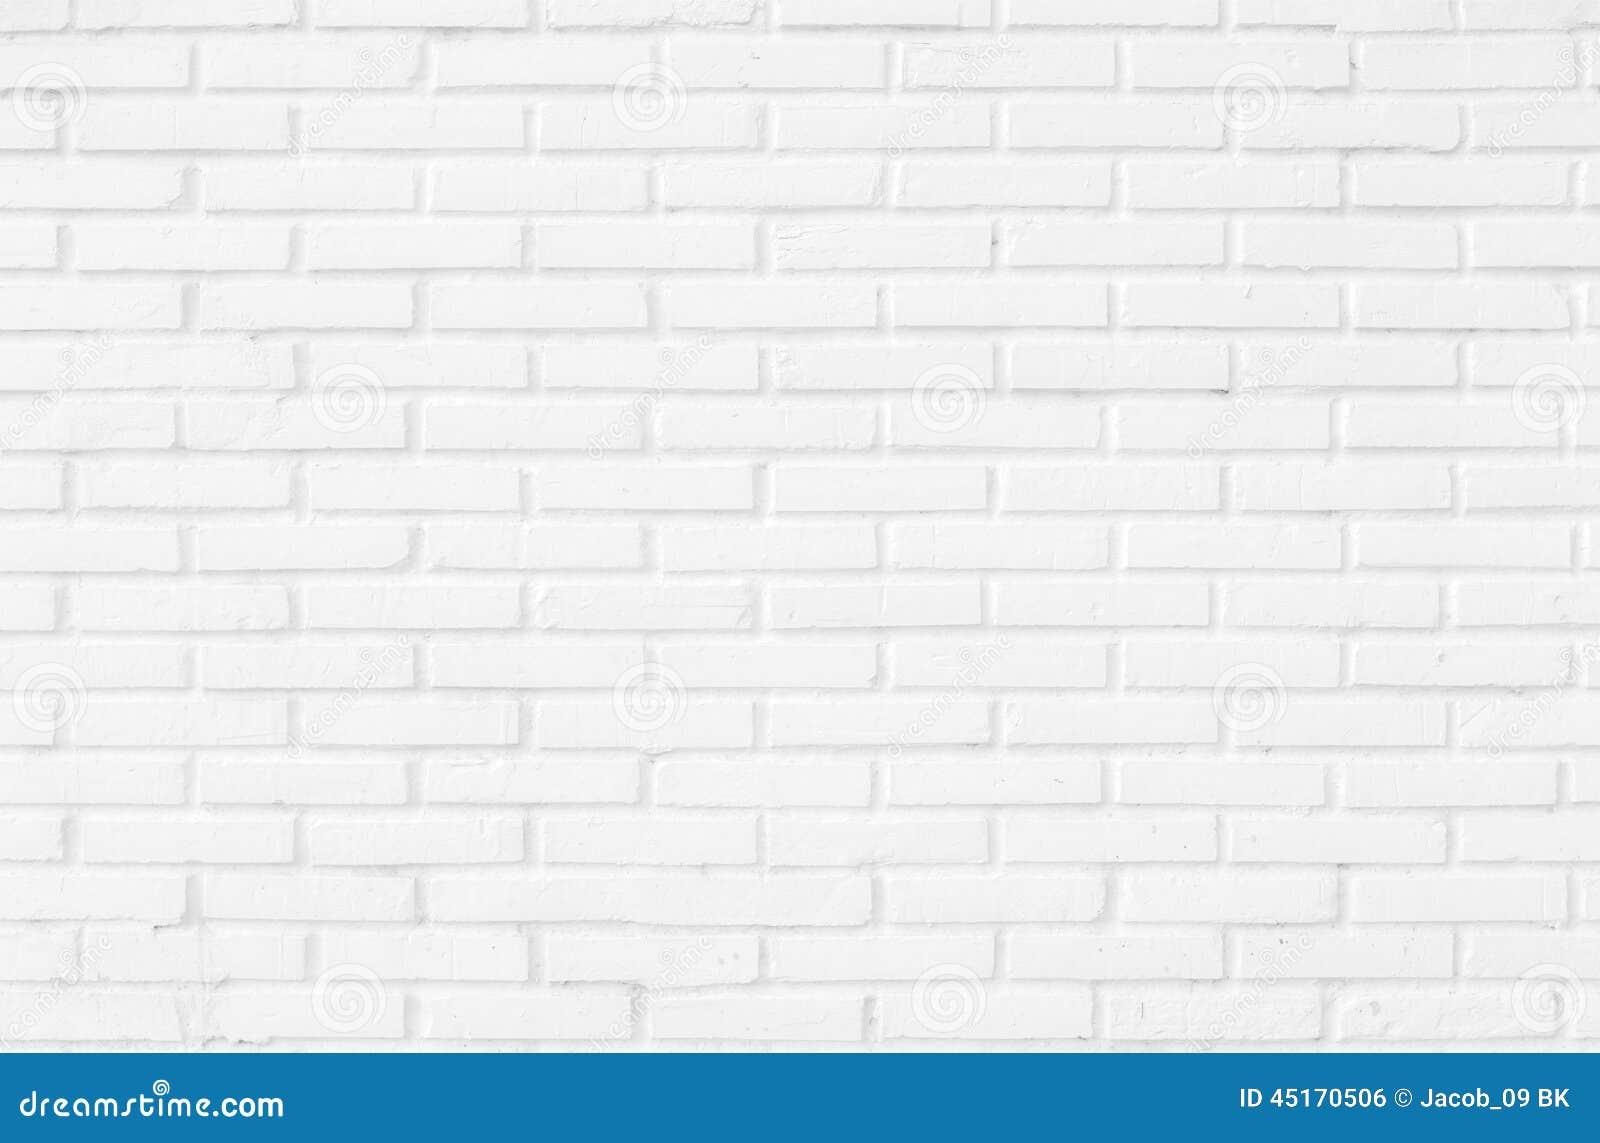 White brick wall texture background